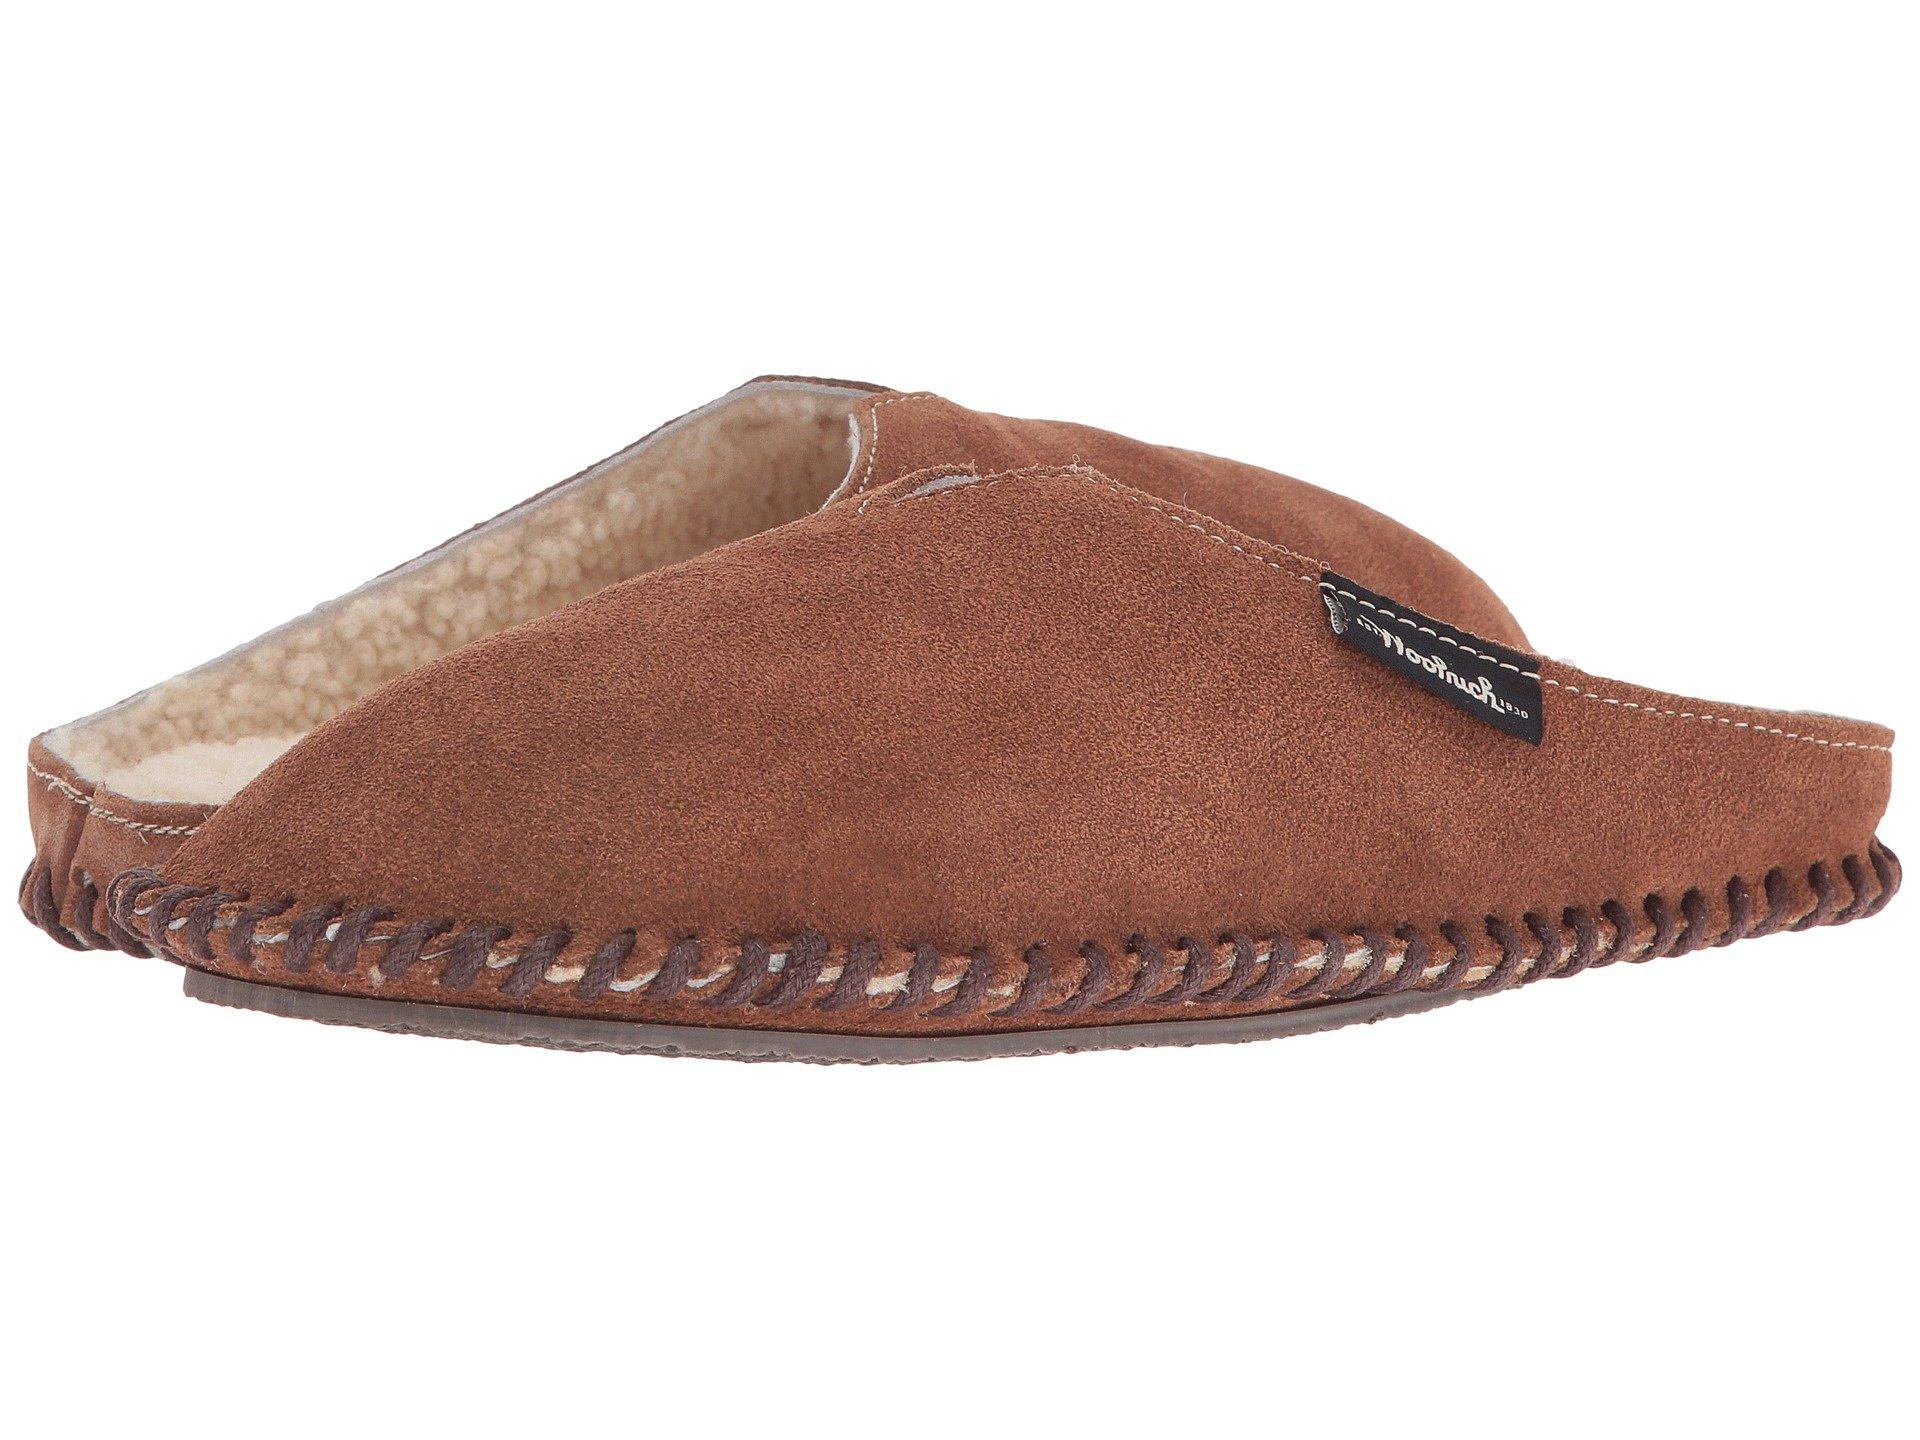 Zapato de Descanso para Mujer Woolrich Suede Mill Scuff  + Woolrich en VeoyCompro.net